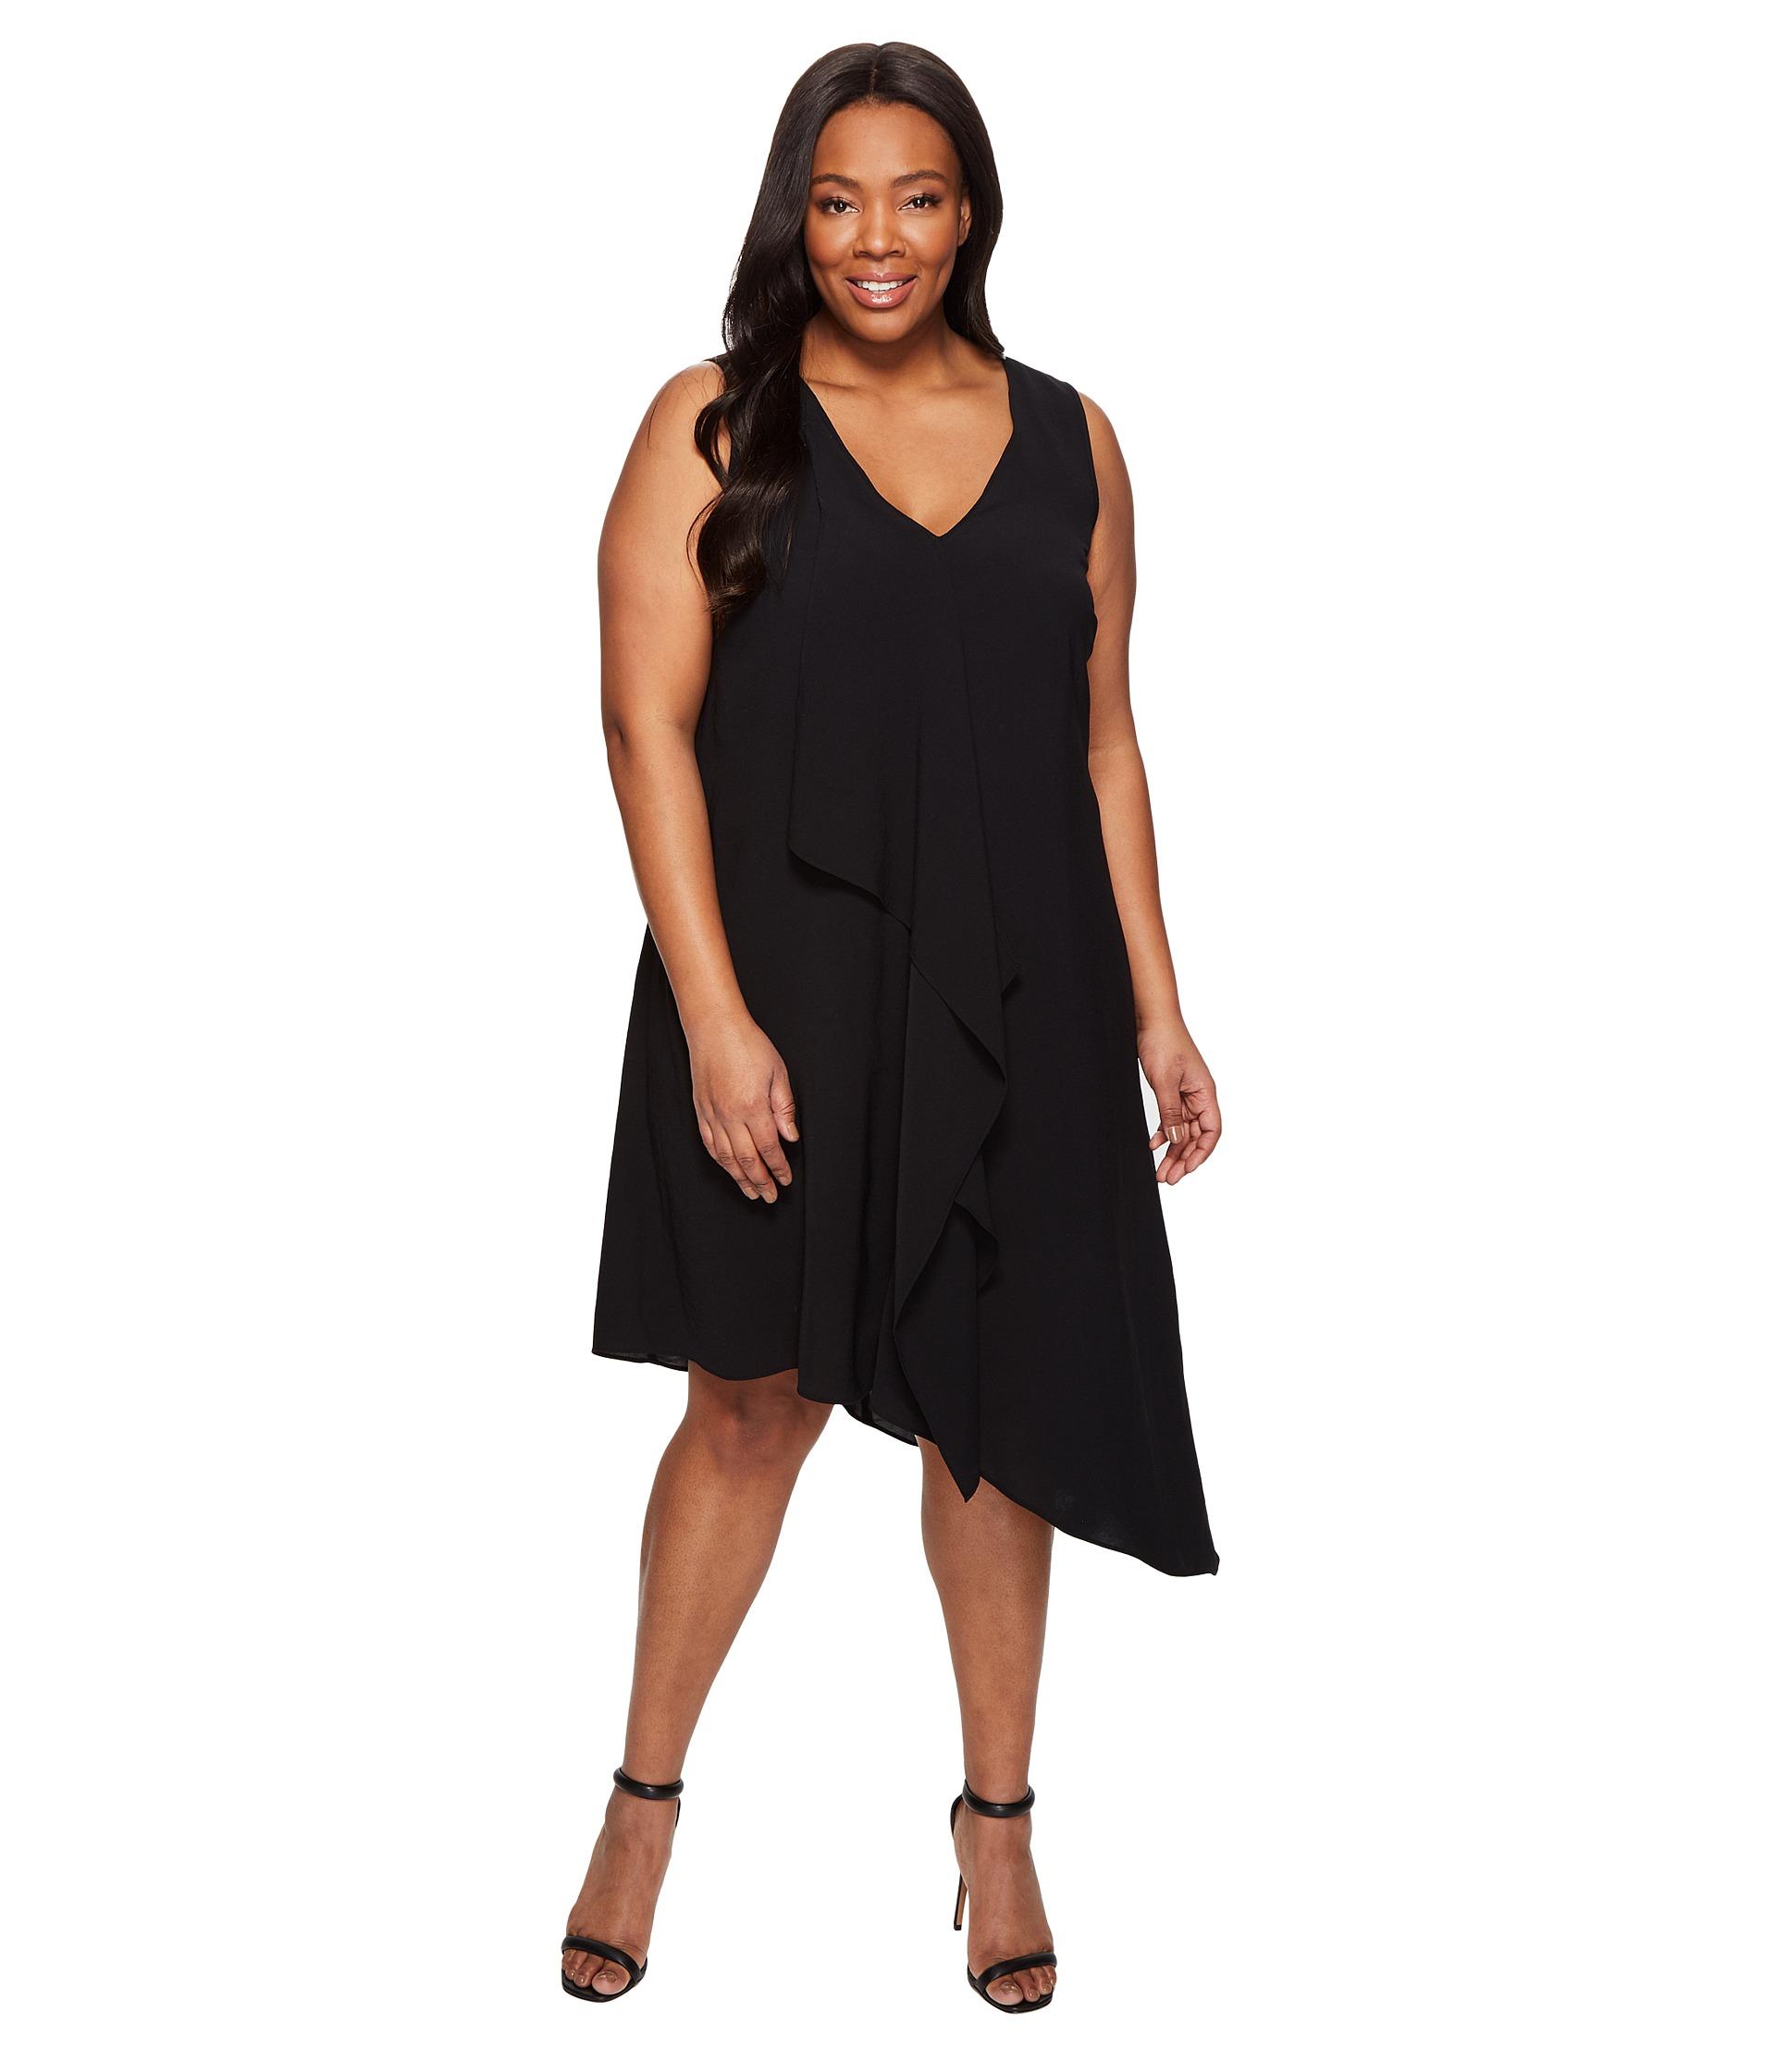 Asymmetric Drape Dress: Adrianna Papell Plus Size Asymmetrical Front Drape Dress